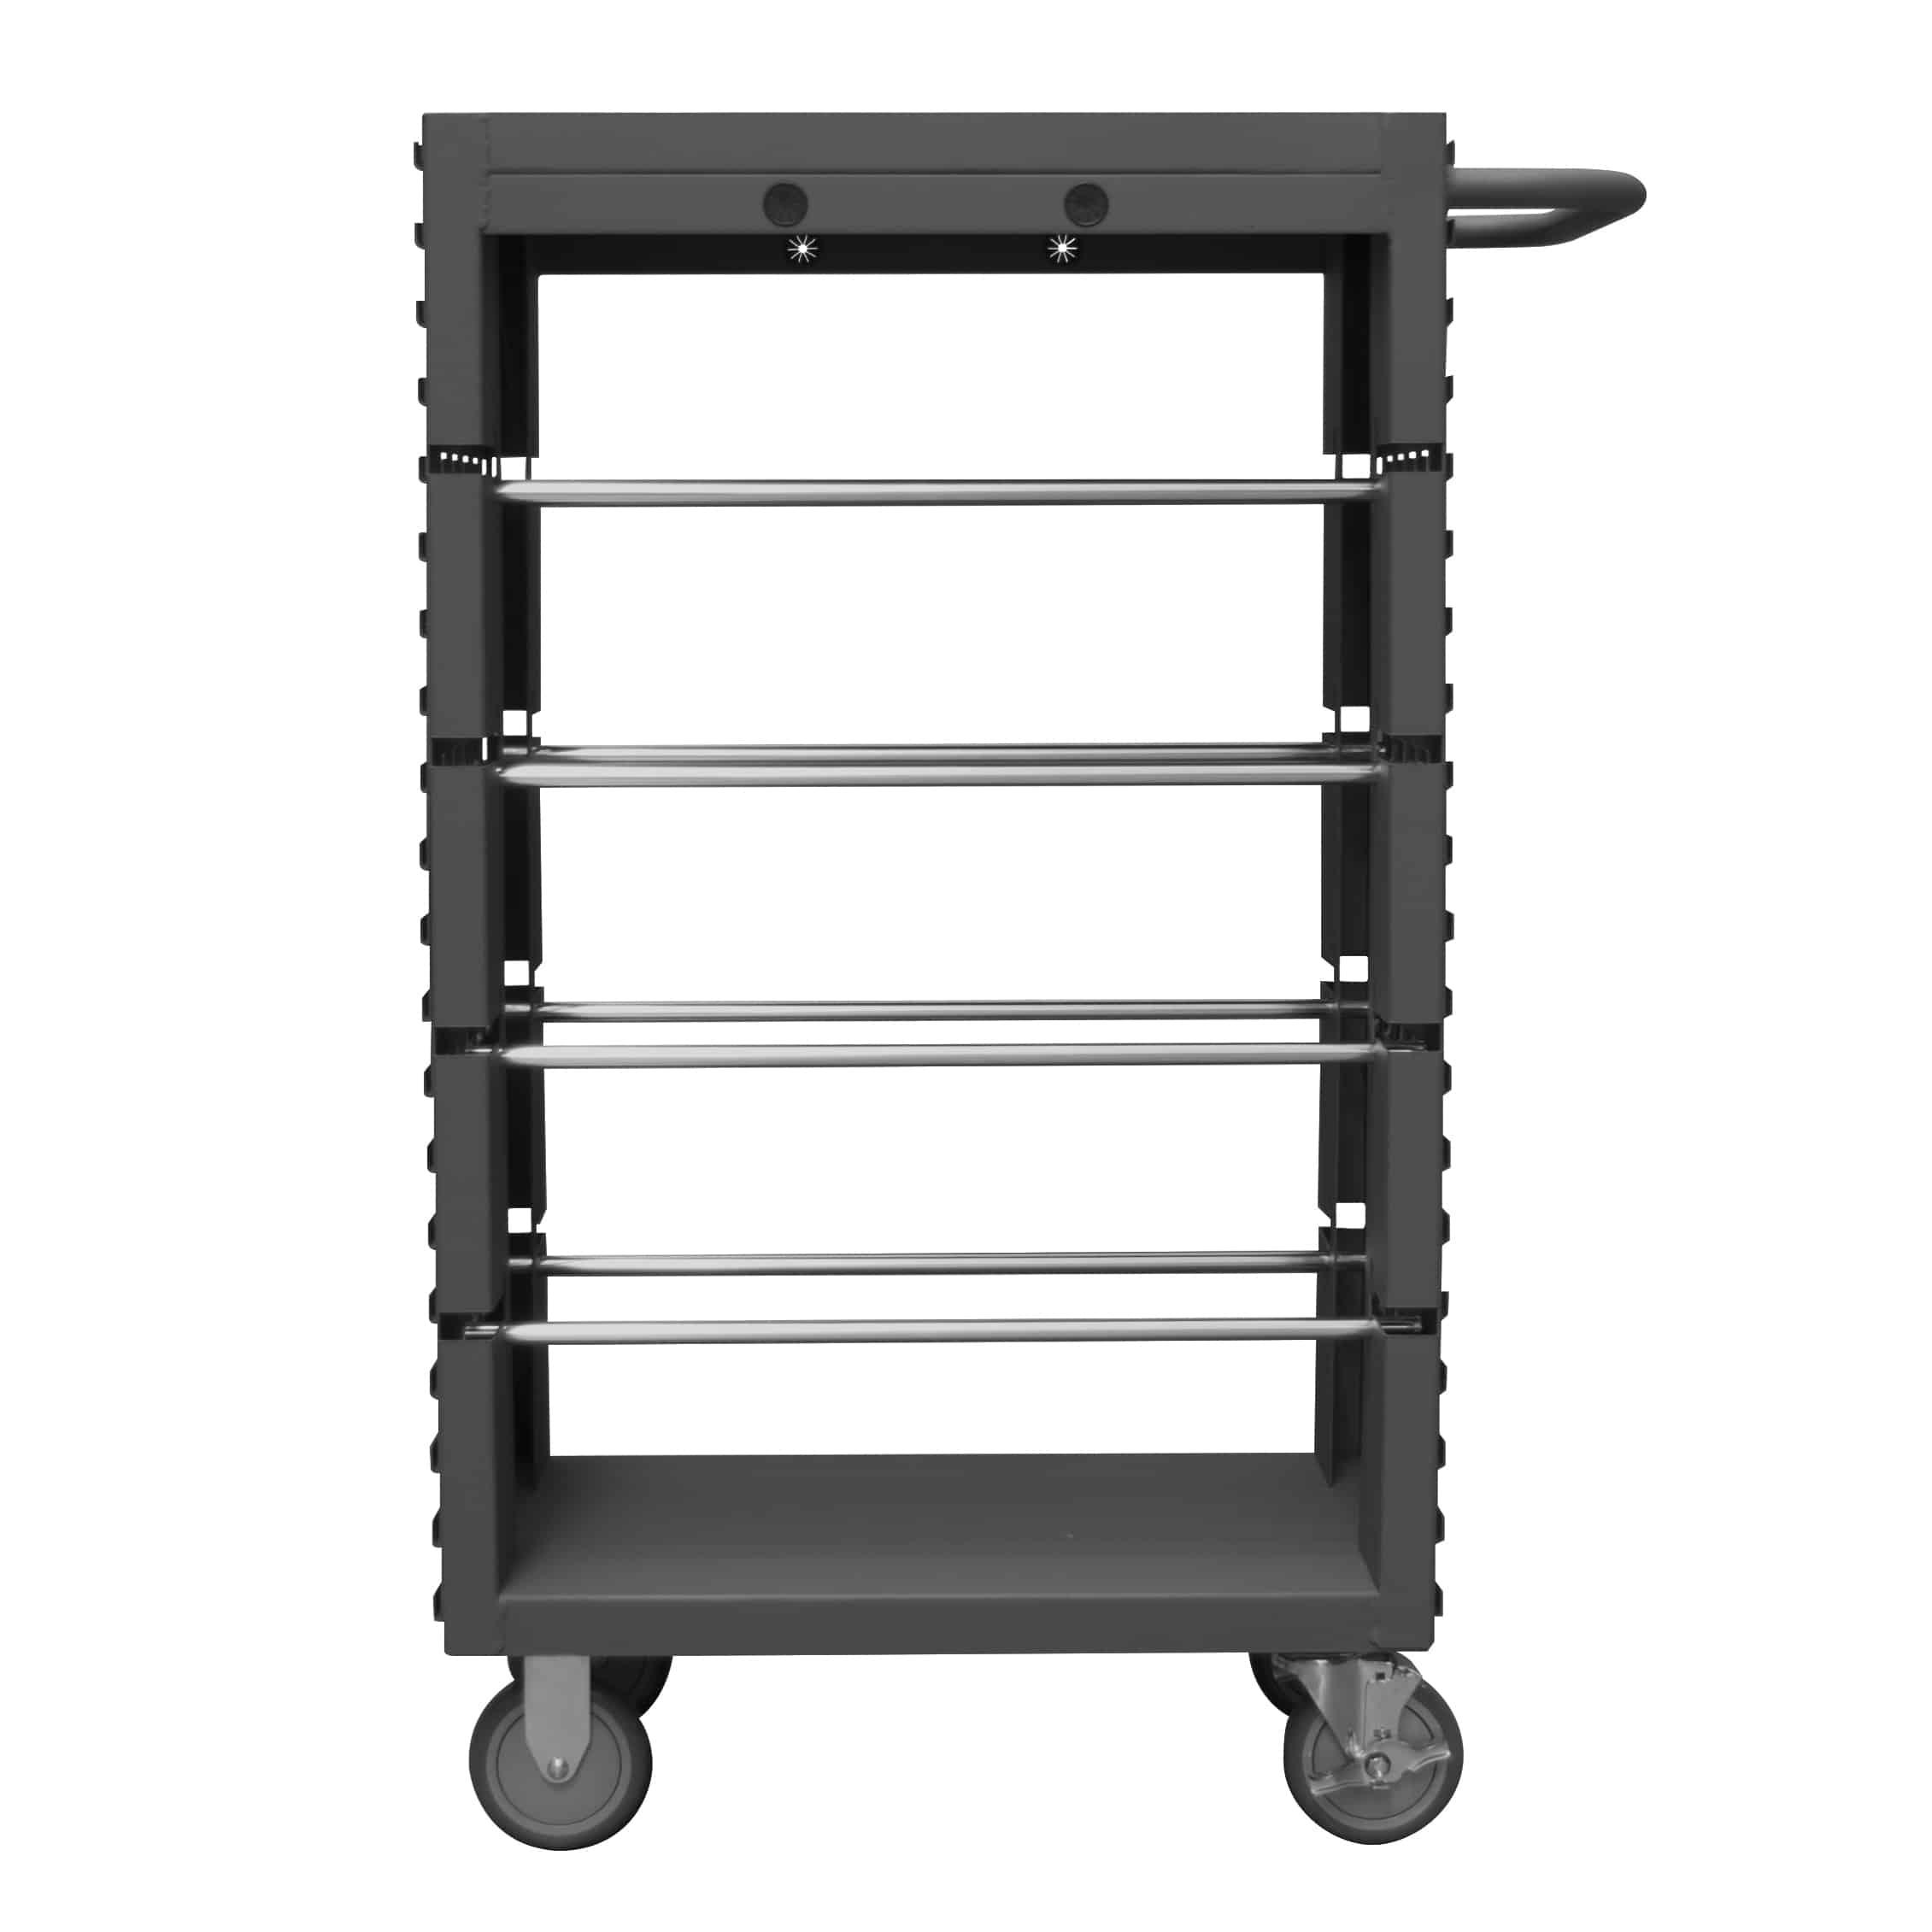 8 Rod Steel Mobile Wire Spool Rack Trolley | Storage N Stuff